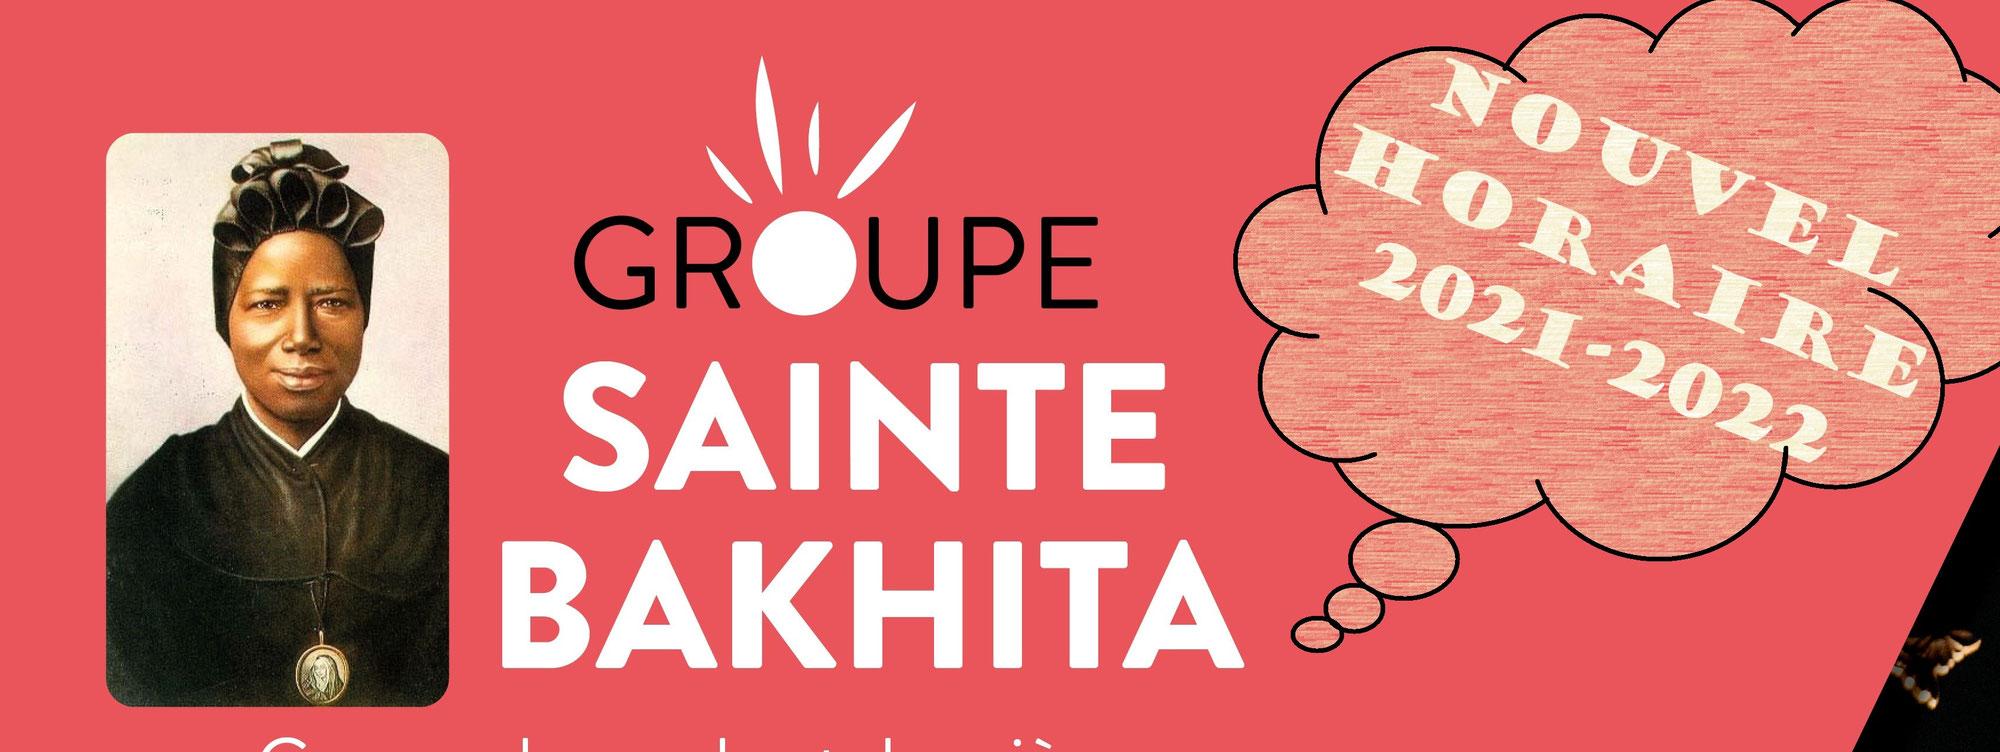 Groupe Sainte Bakhita - nouvel horaire